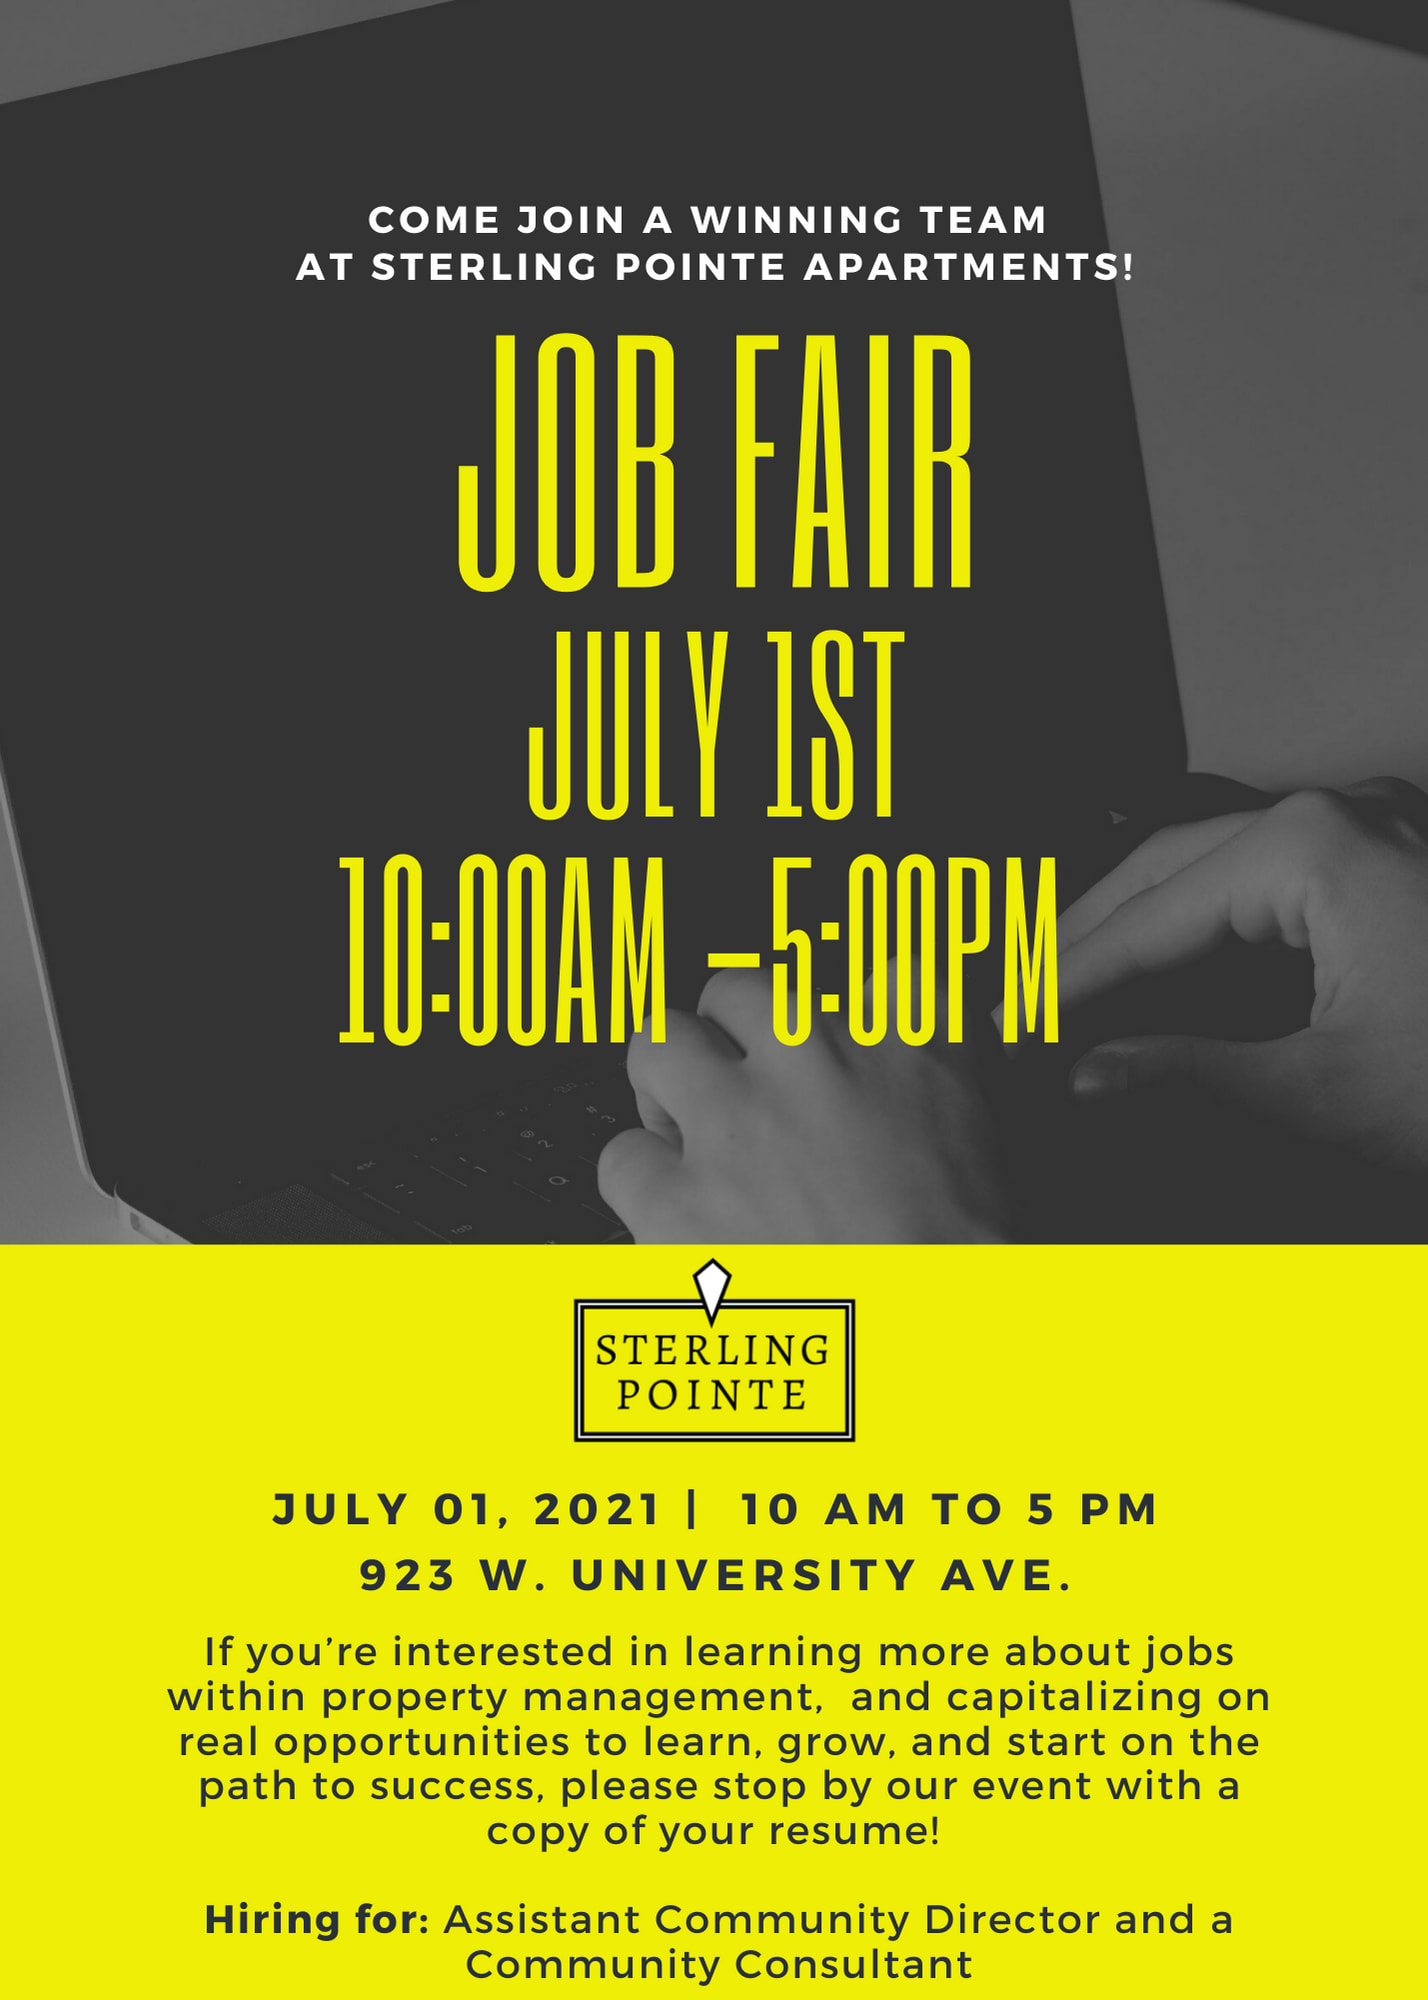 Job Fair at Sterling Pointe in Flagstaff, AZ